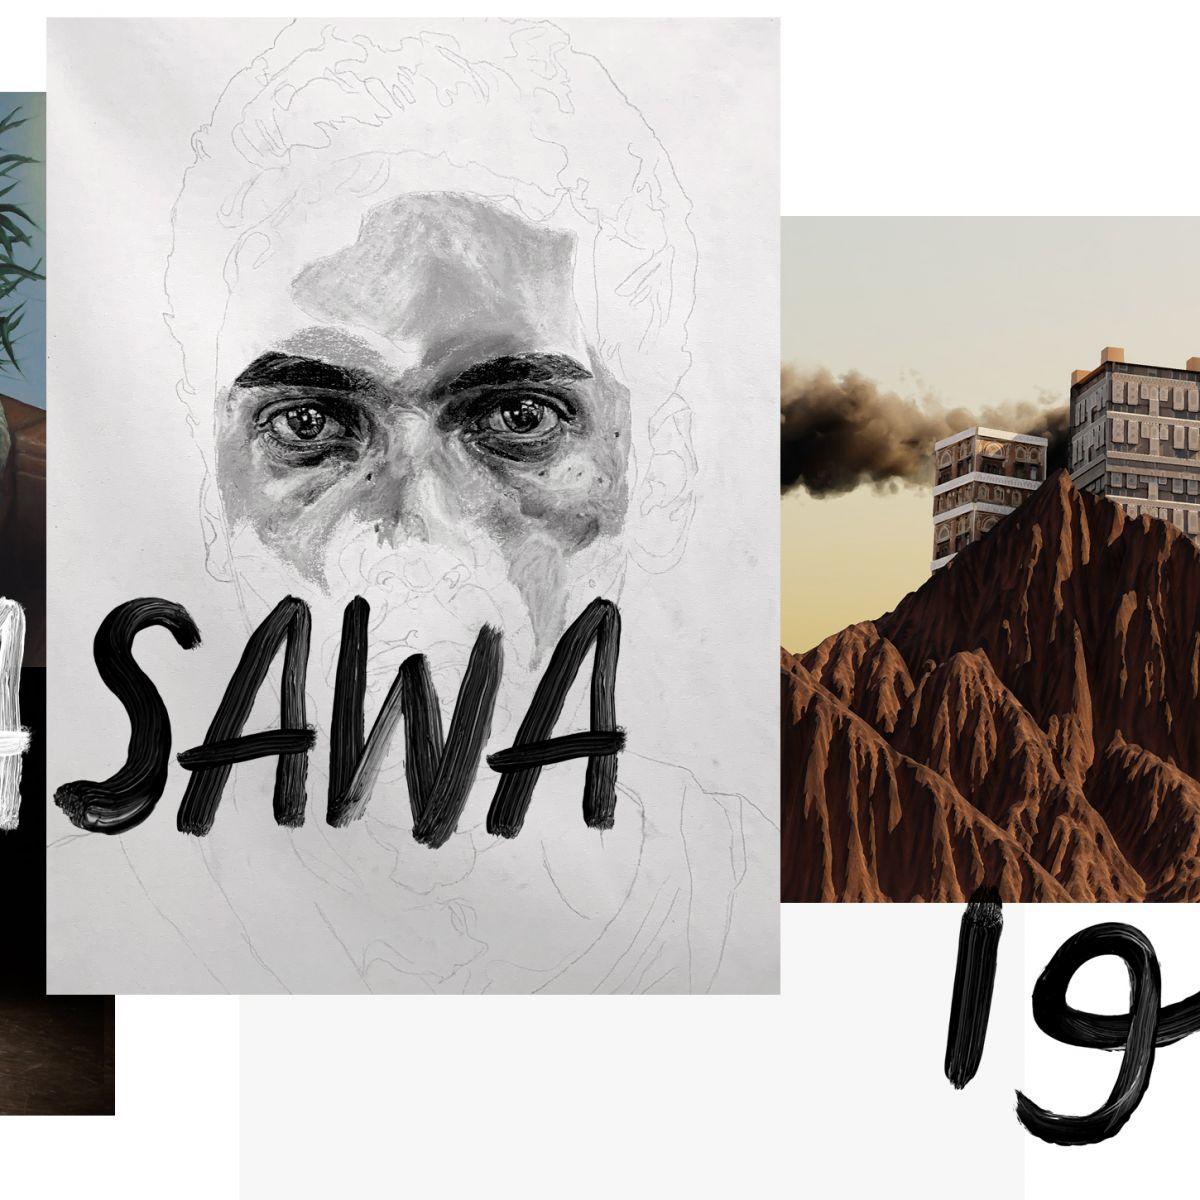 Montage of artworks